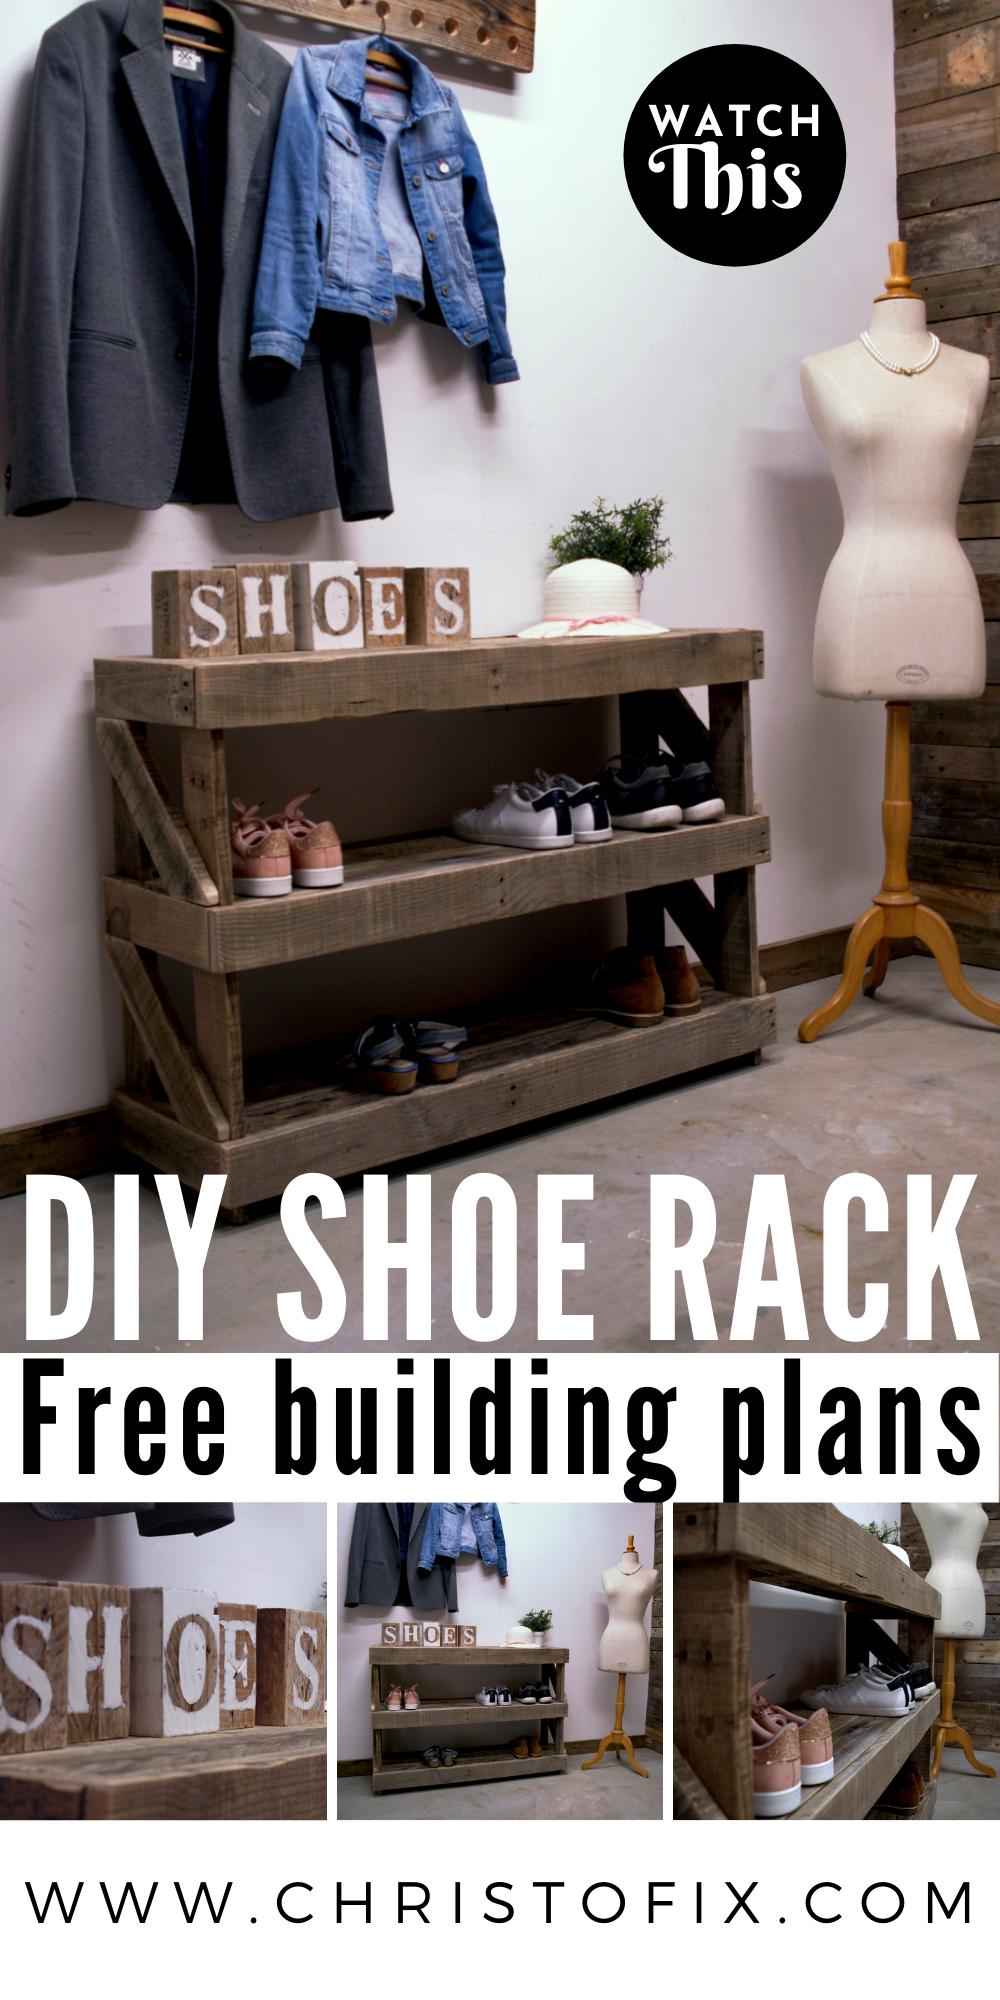 DIY shoe rack   free building plans#building #diy #free #plans #rack #shoe